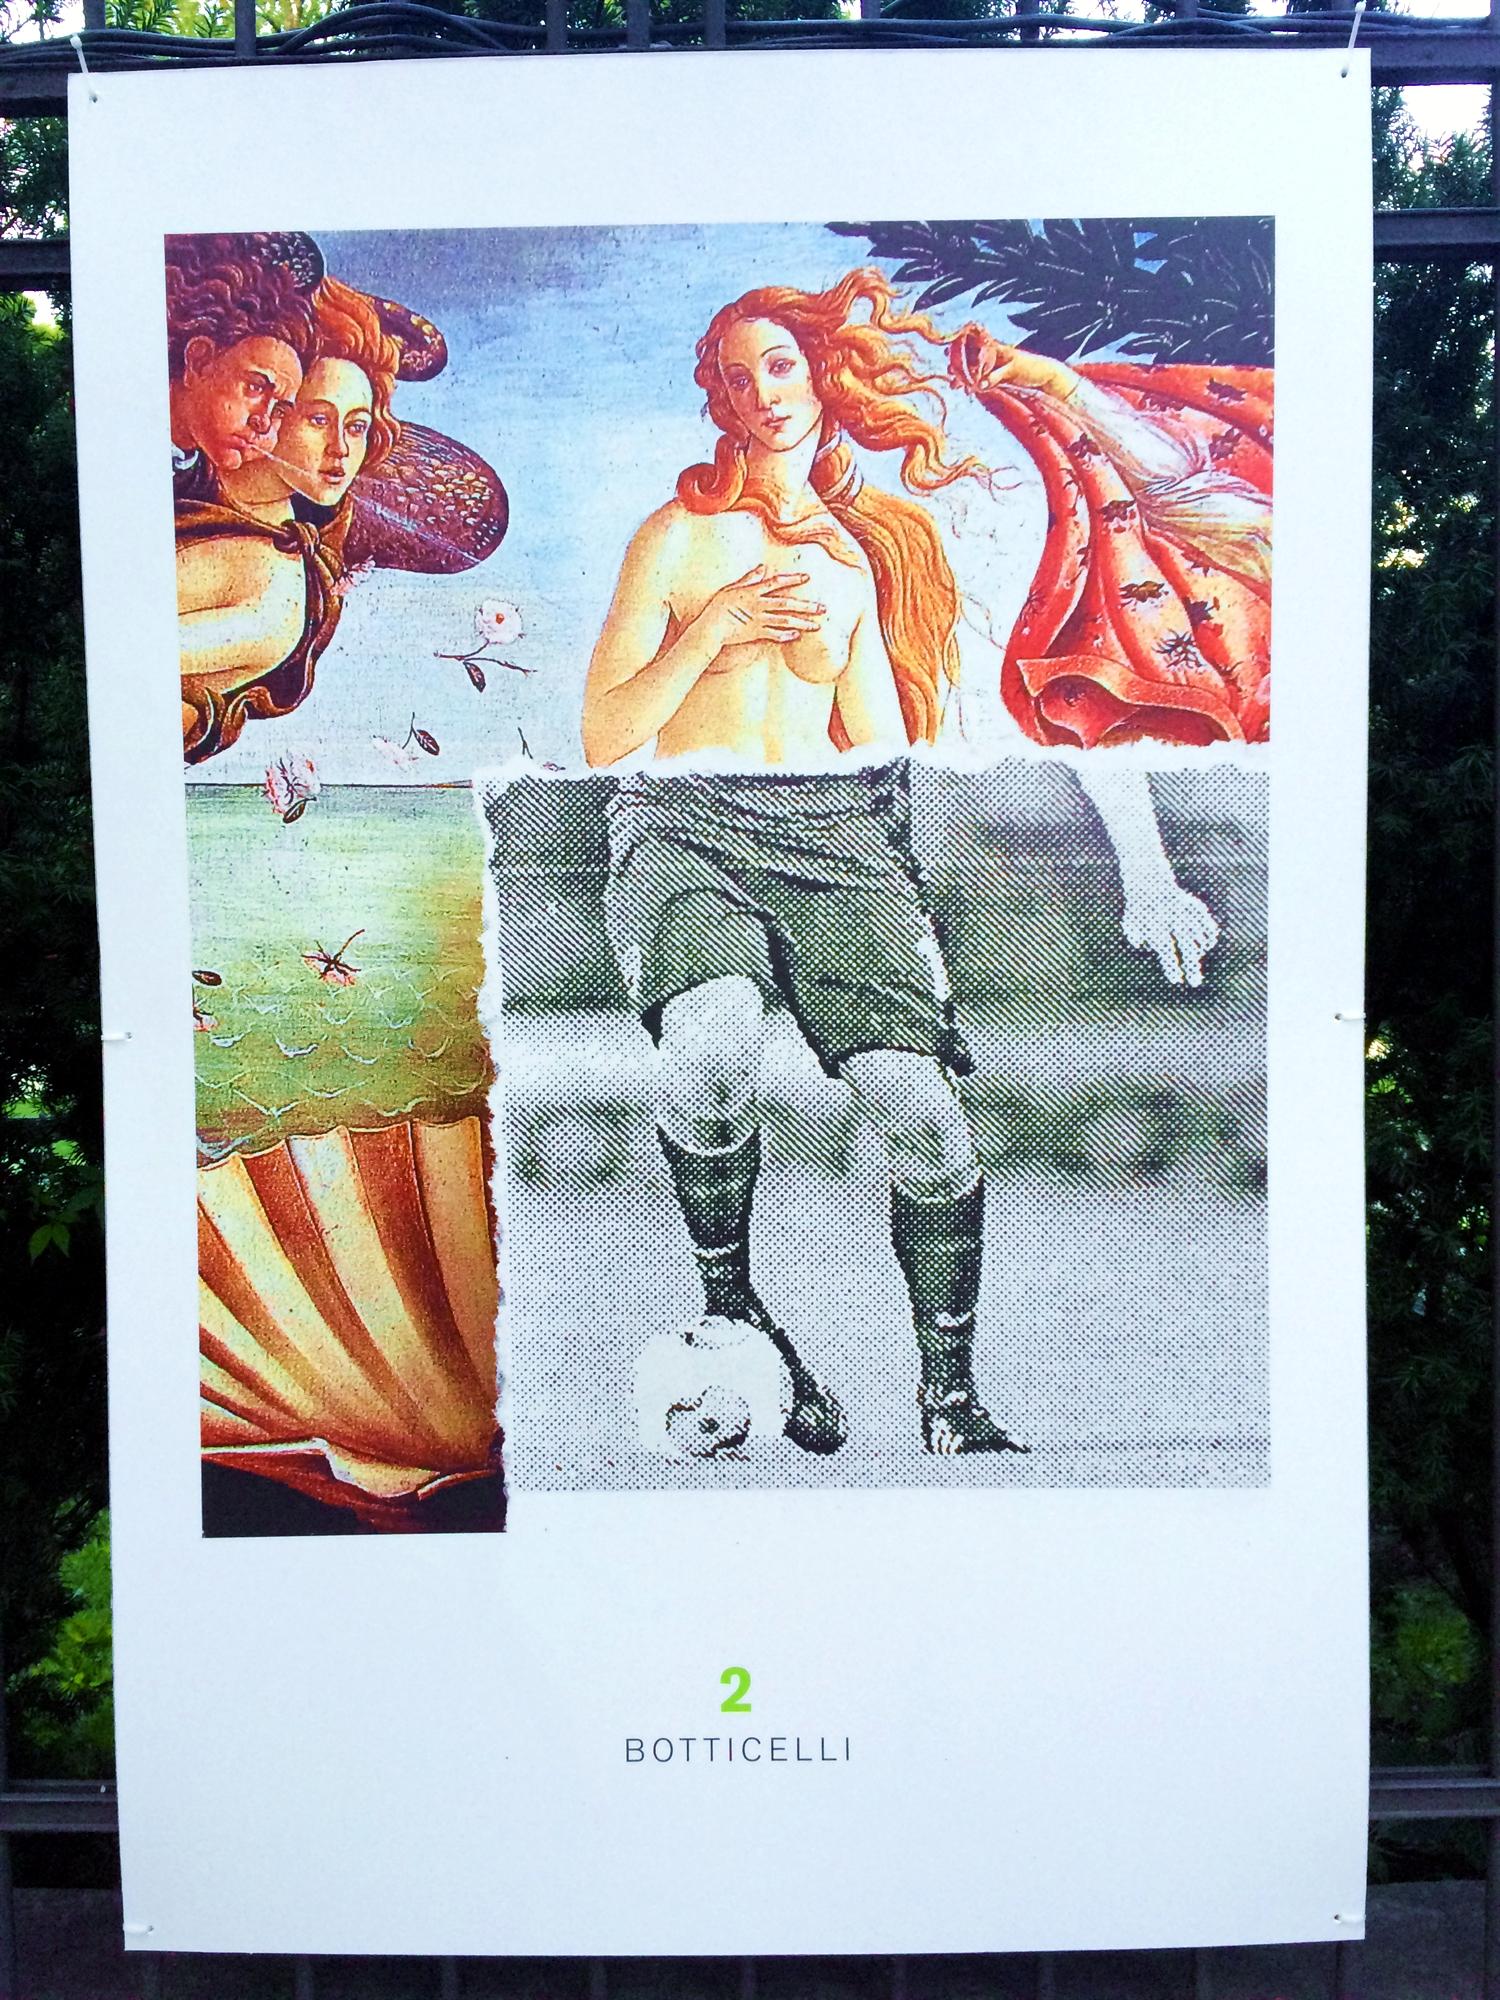 31 Mexican poster street art design plakat meksykanski projektowanie uzytkowe sztuka uliczna FORelementspl